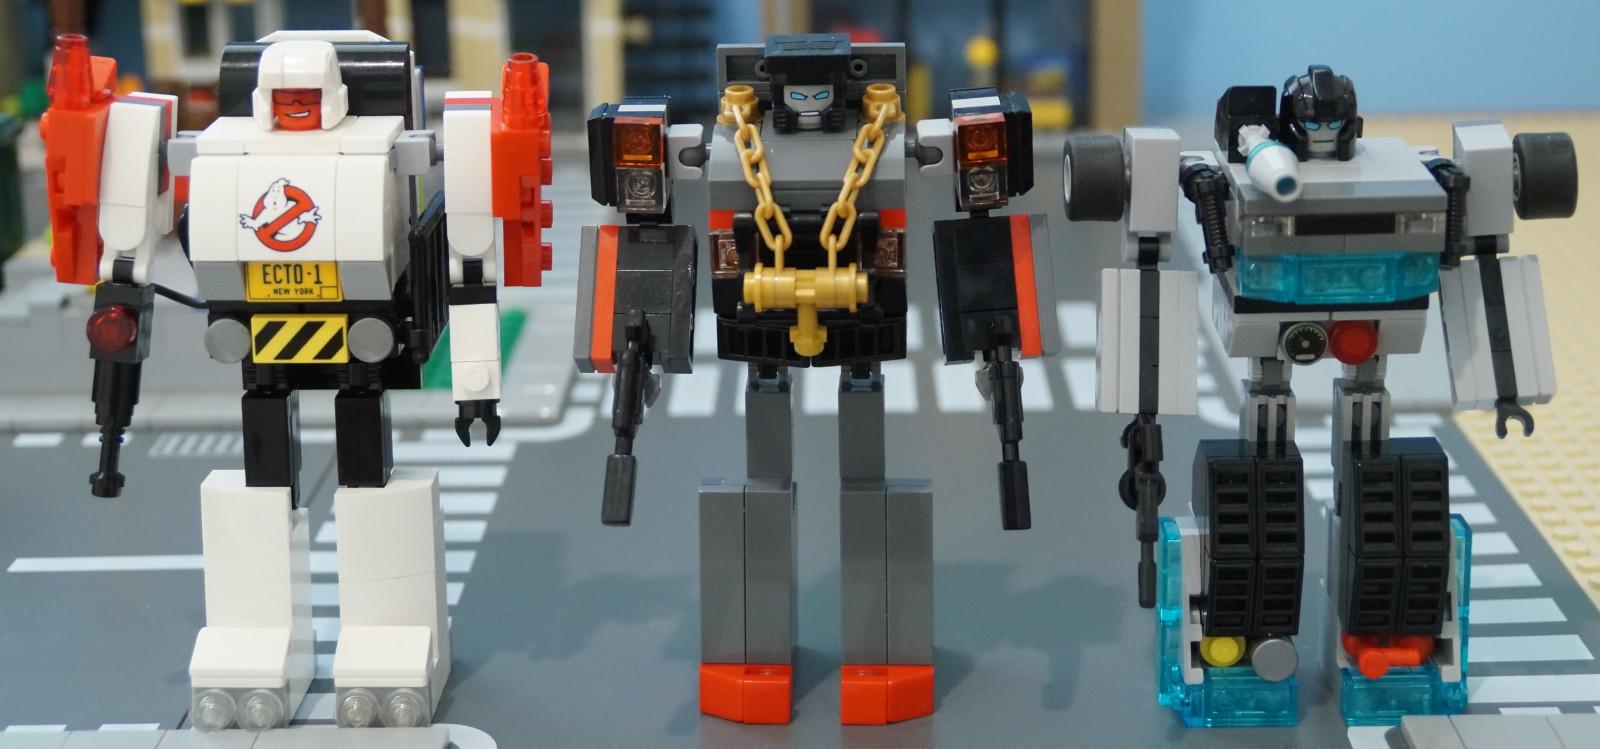 Sfondi : giocattoli robot cartone animato lego tecnologia